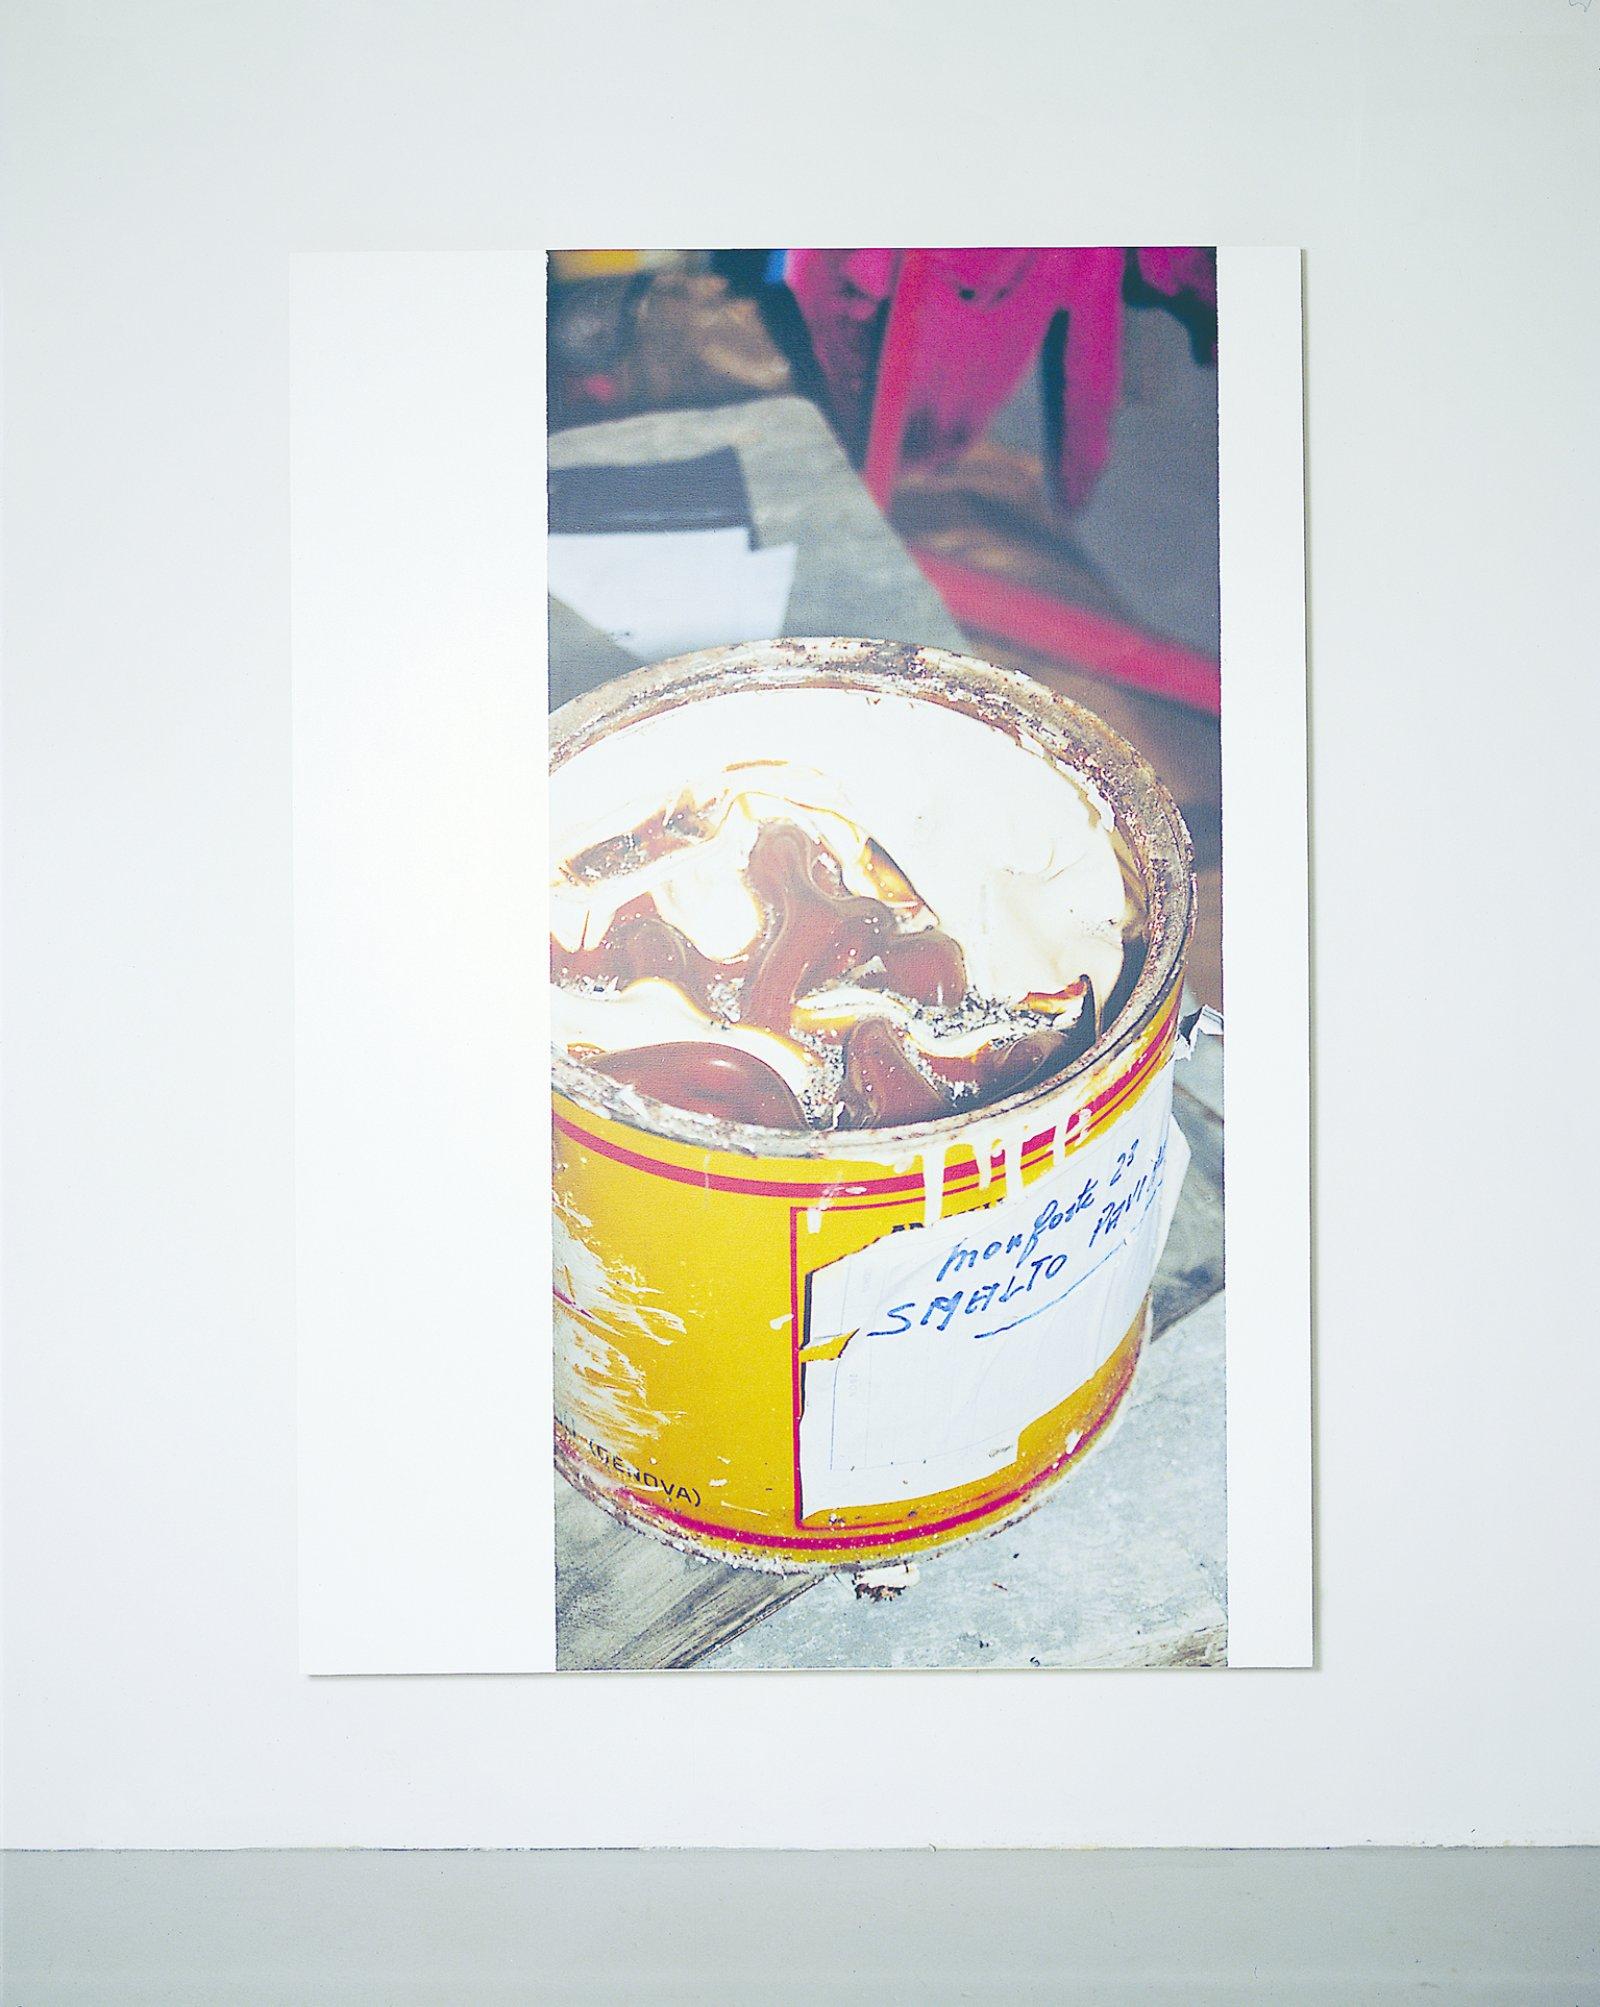 Ian Wallace,The Fontana Series II, 1988, photolaminate and acrylic on canvas, 96 x 60 in. (243 x 152 cm)